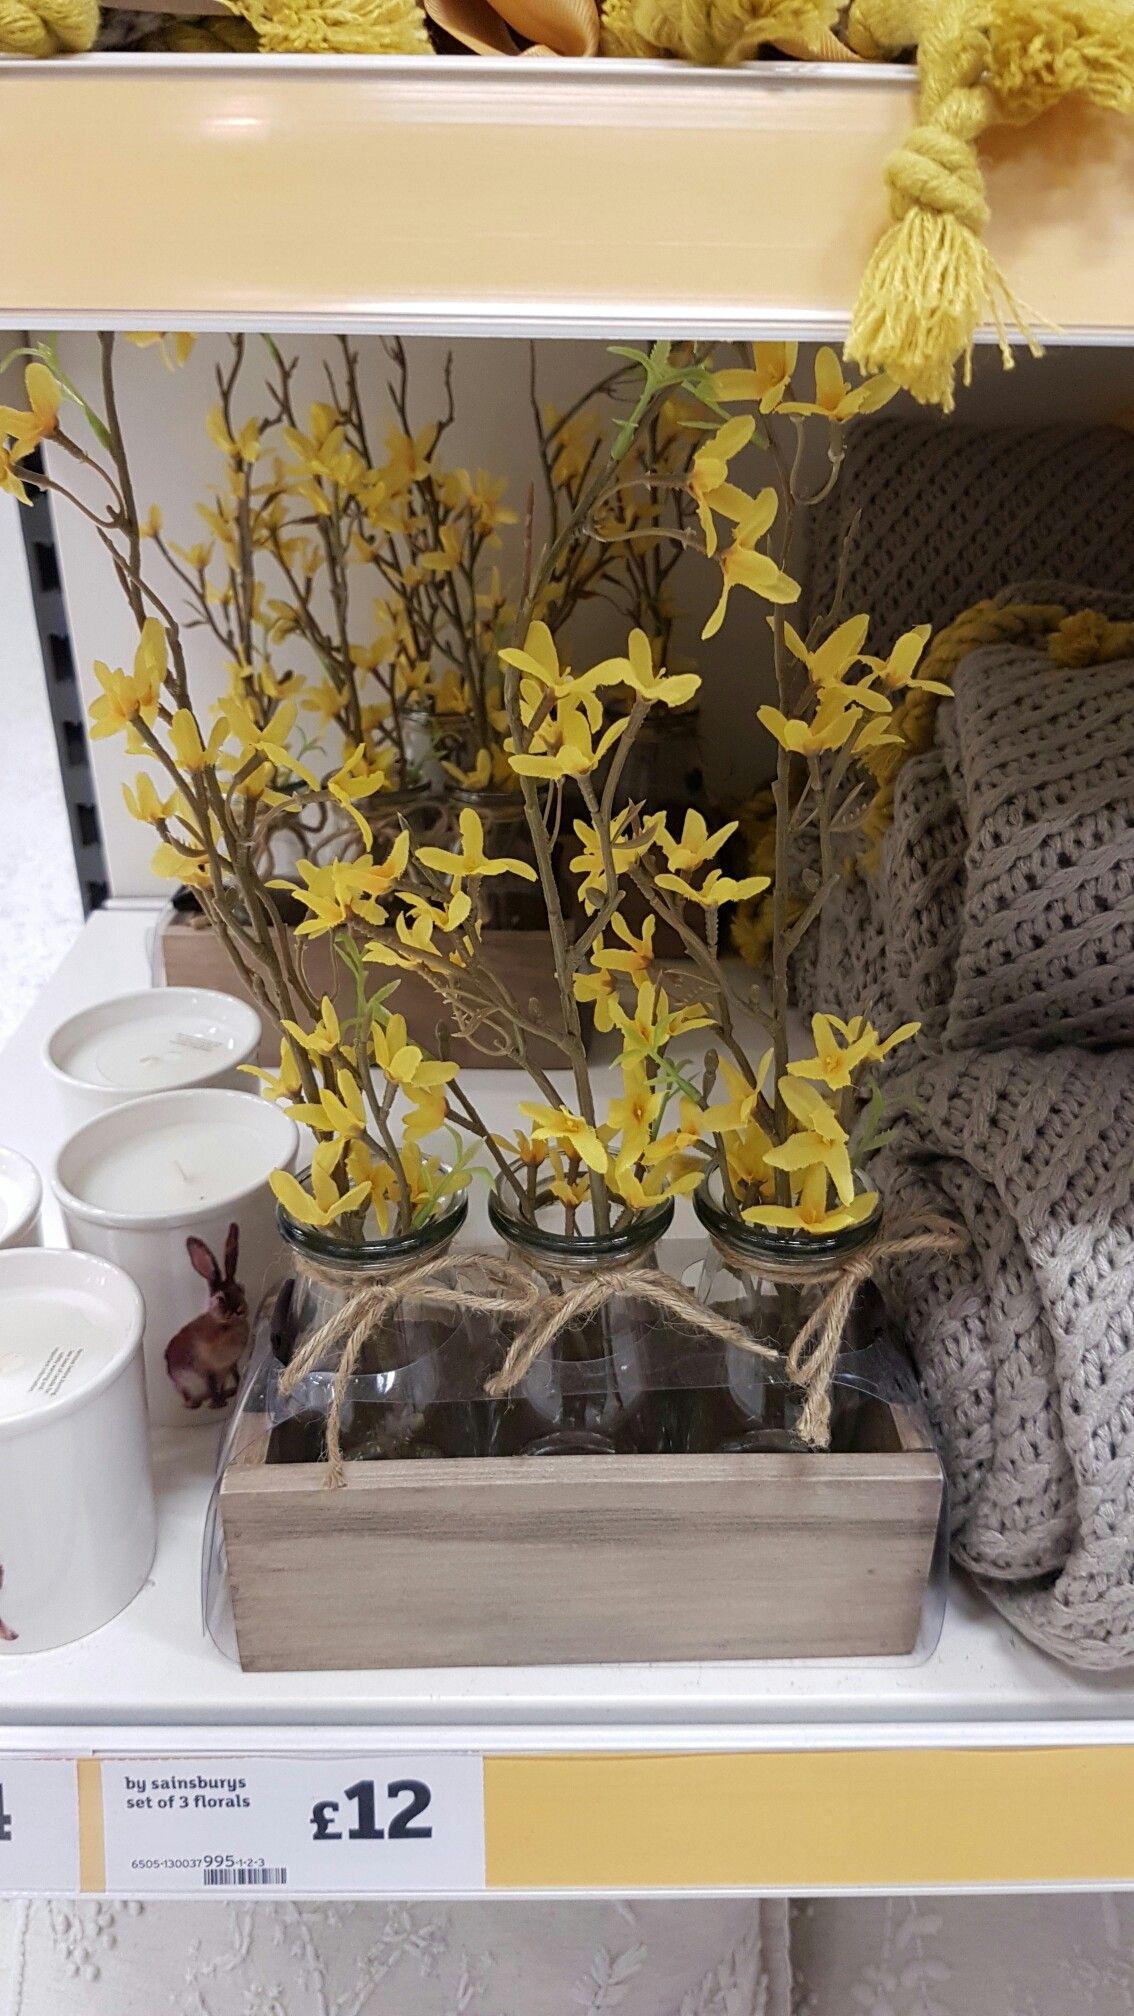 Sainsburys cute flower jars | My Place | Pinterest